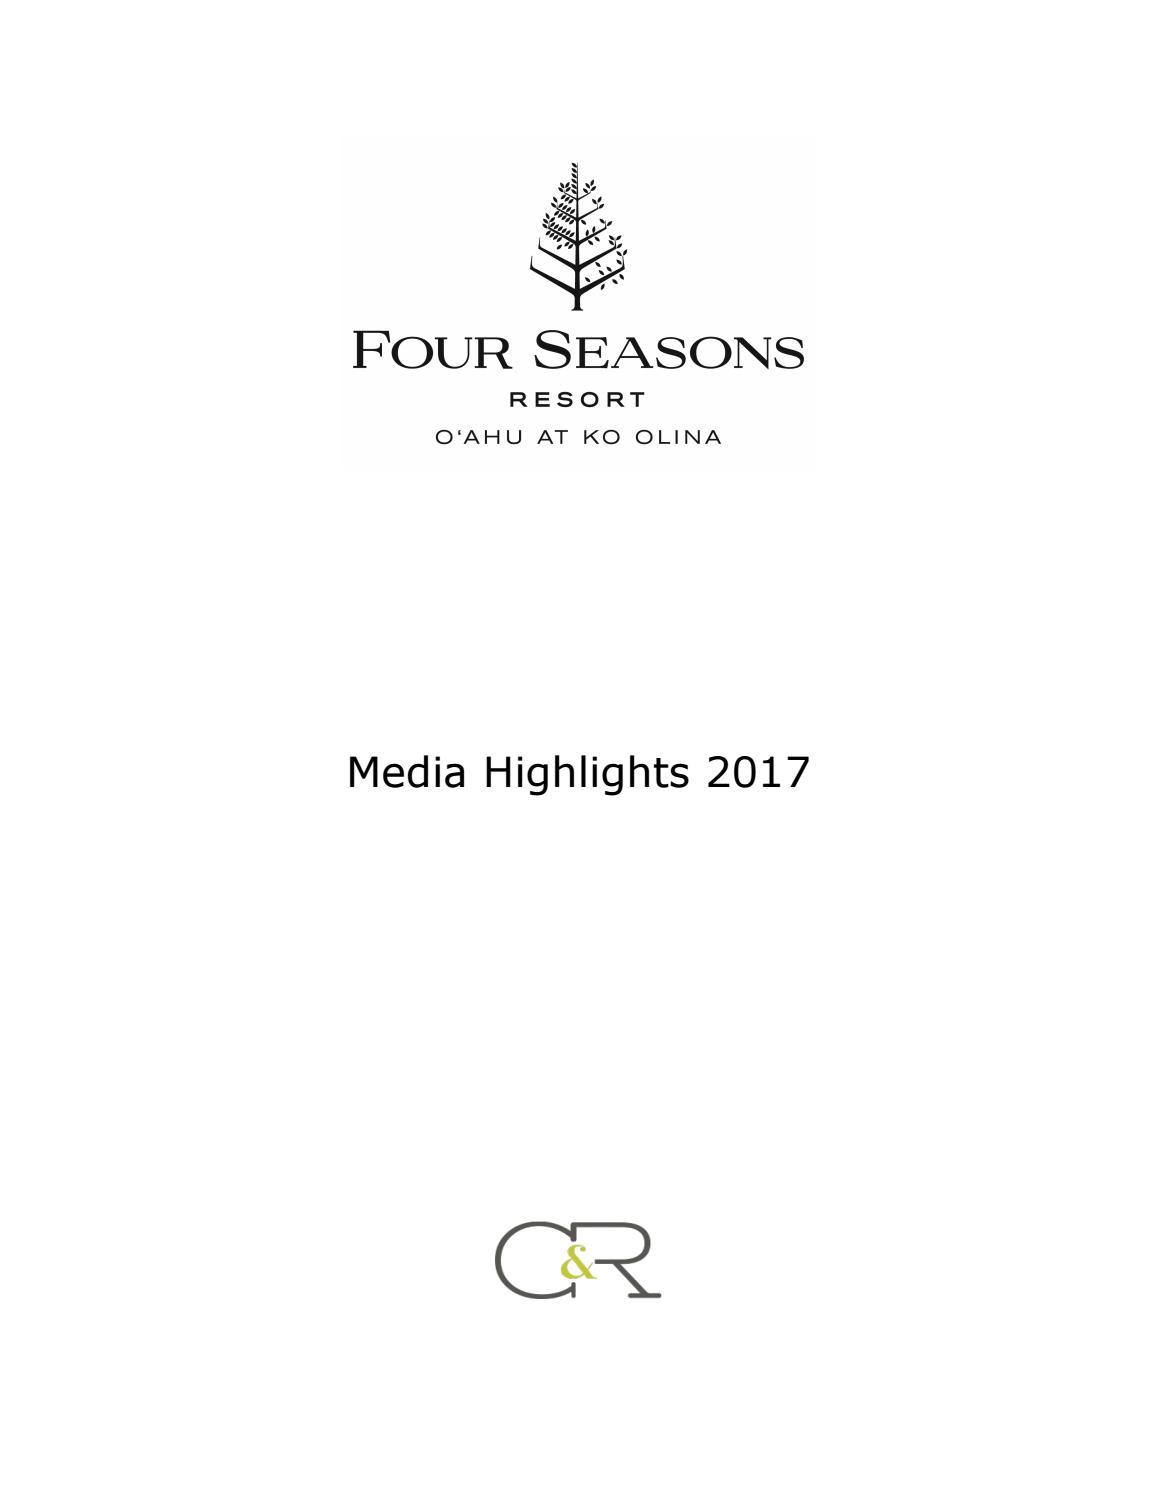 Enjoyable Four Seasons Oahu Media Highlights 2017 By Cr Pr Issuu Beatyapartments Chair Design Images Beatyapartmentscom